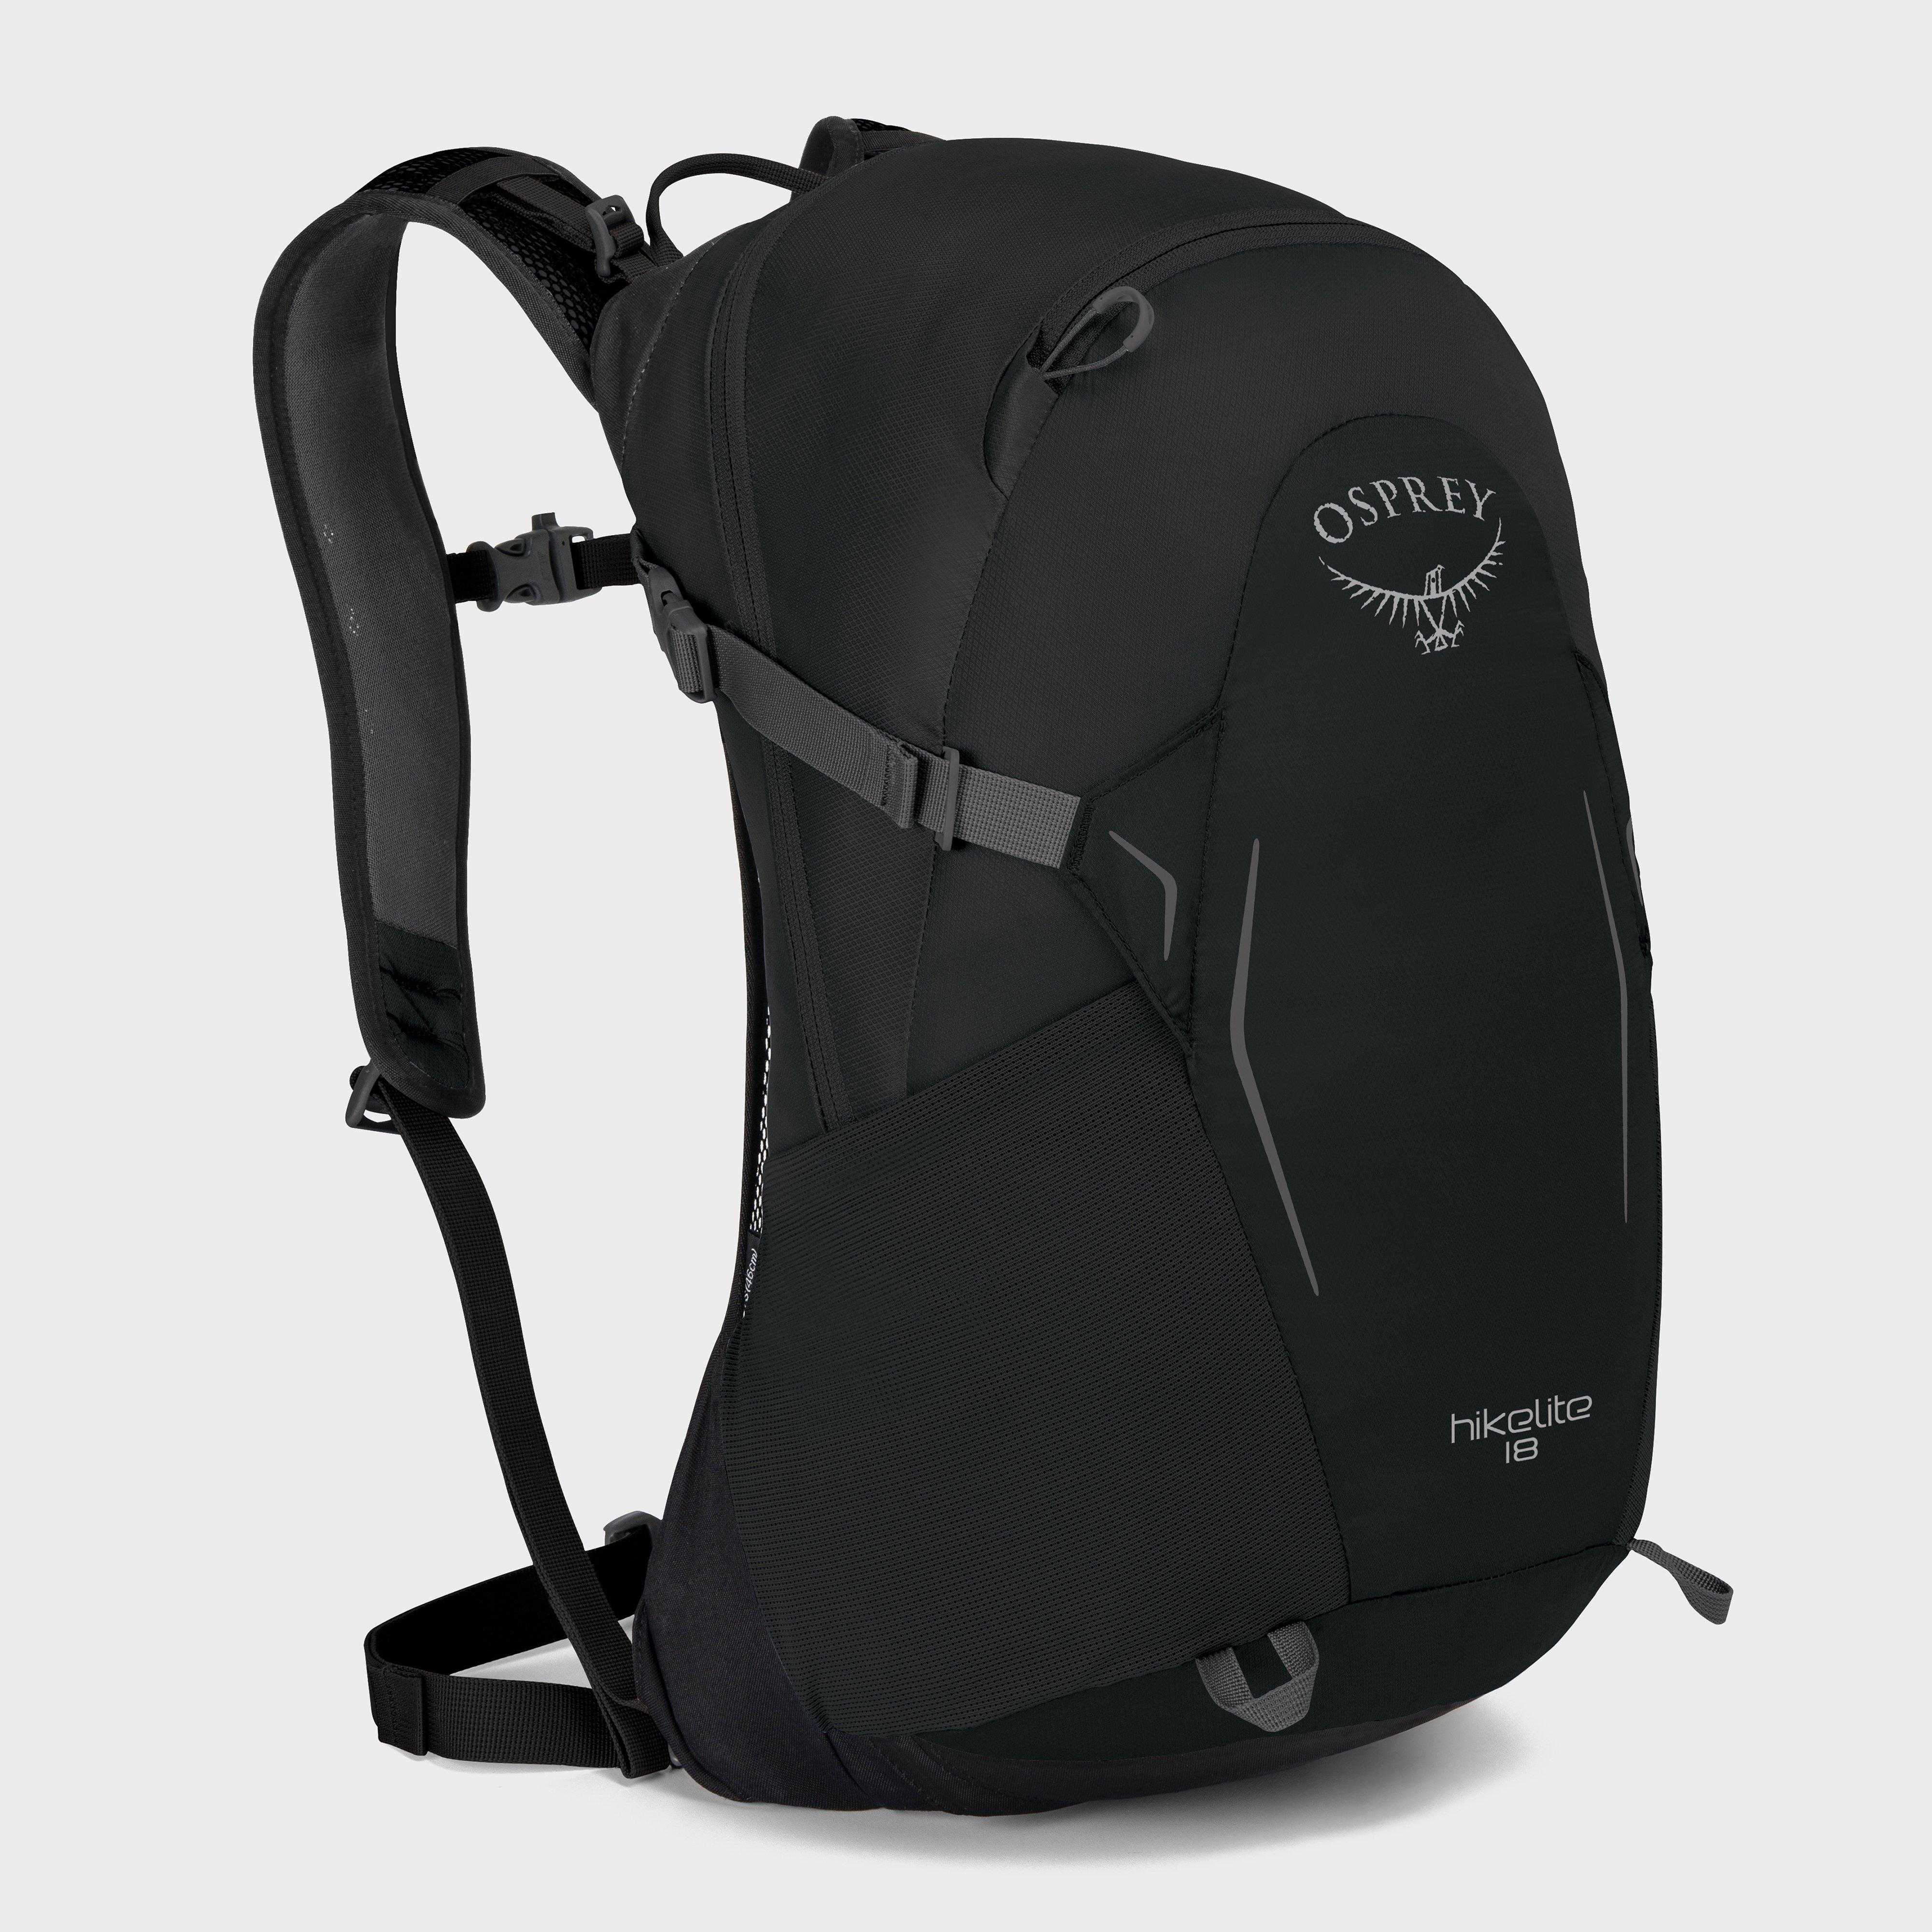 Osprey Hikelite 18 Daypack - Black, Black